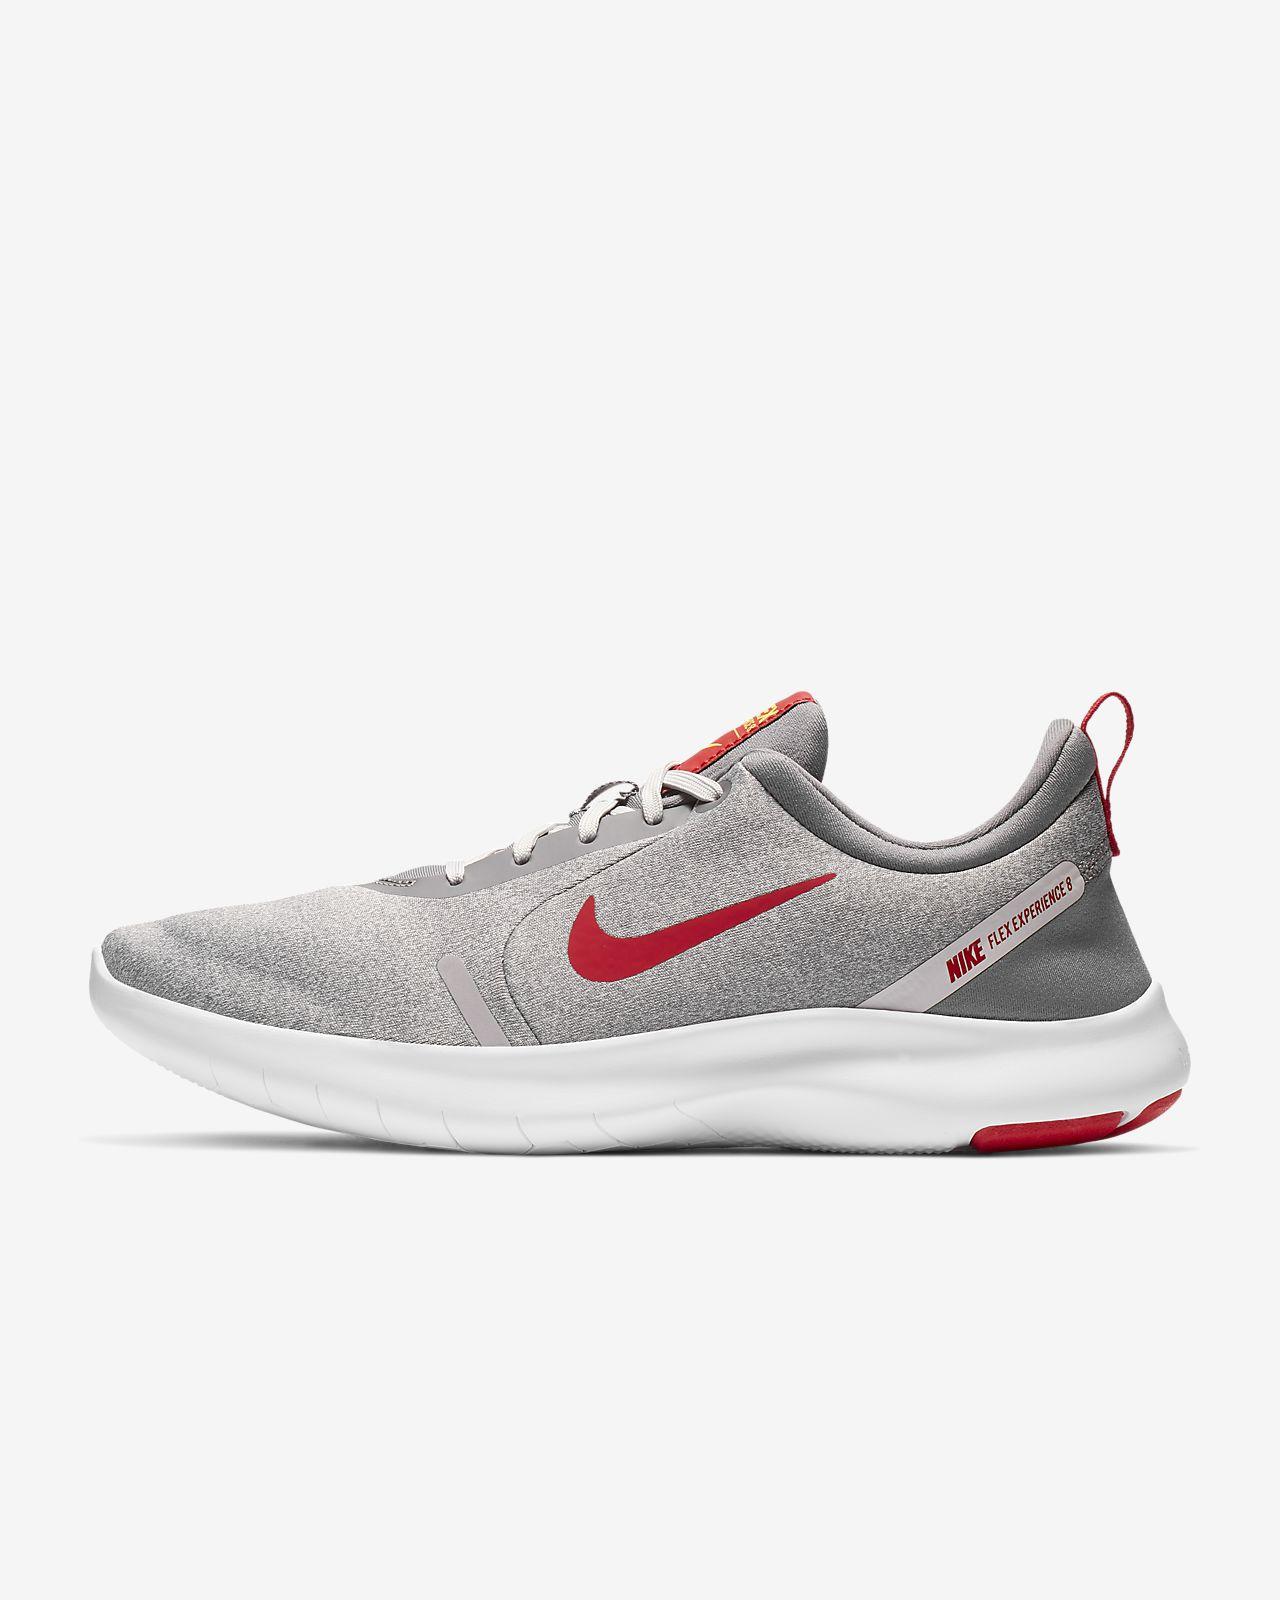 fcc52d6d822ef Nike Flex Experience RN 8 Men s Running Shoe. Nike.com GB